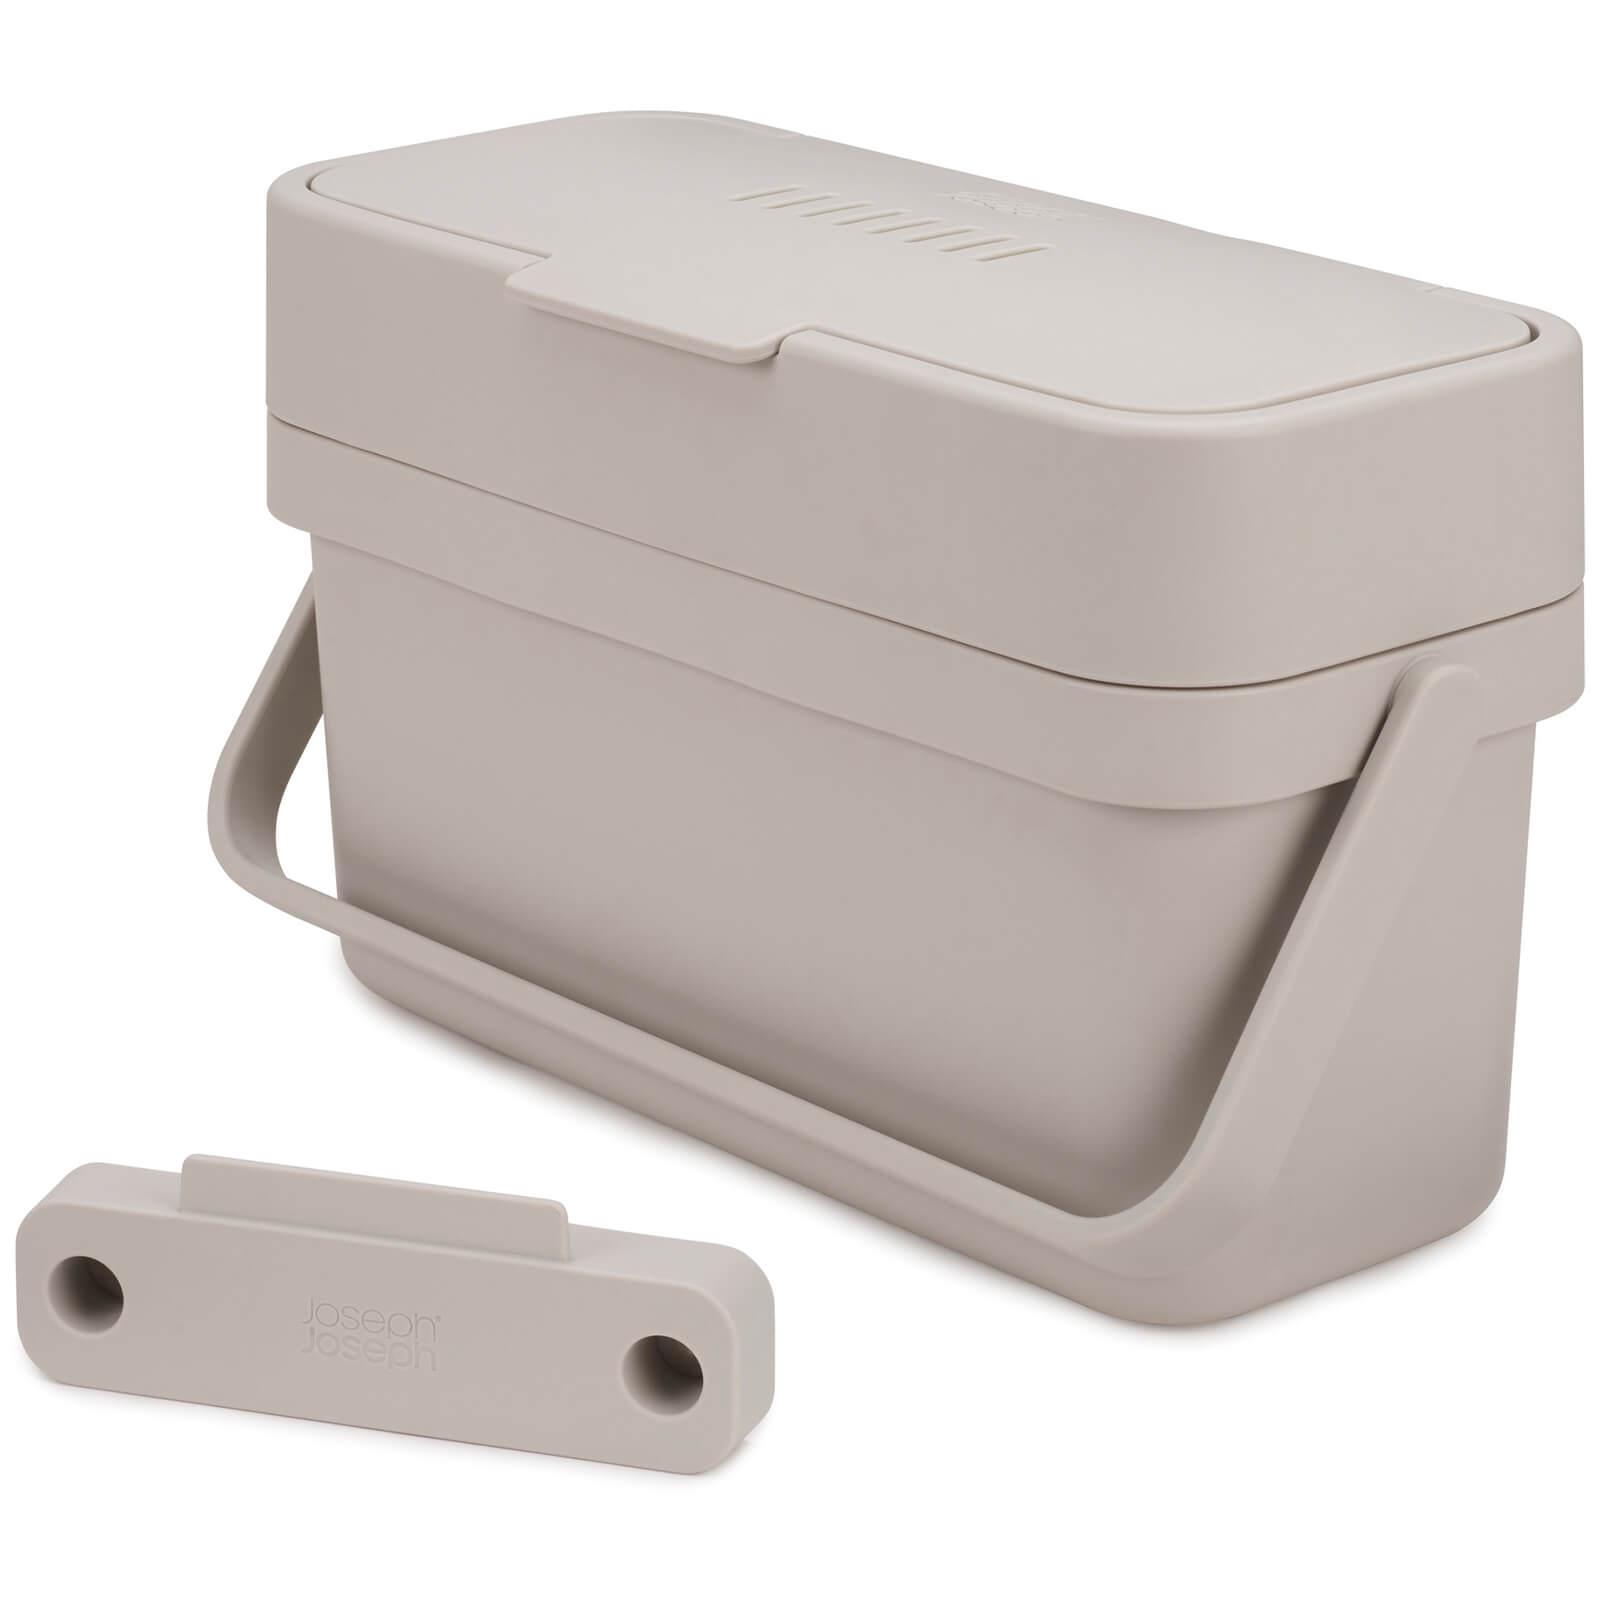 Joseph Joseph Compo 4 Food Waste Caddy